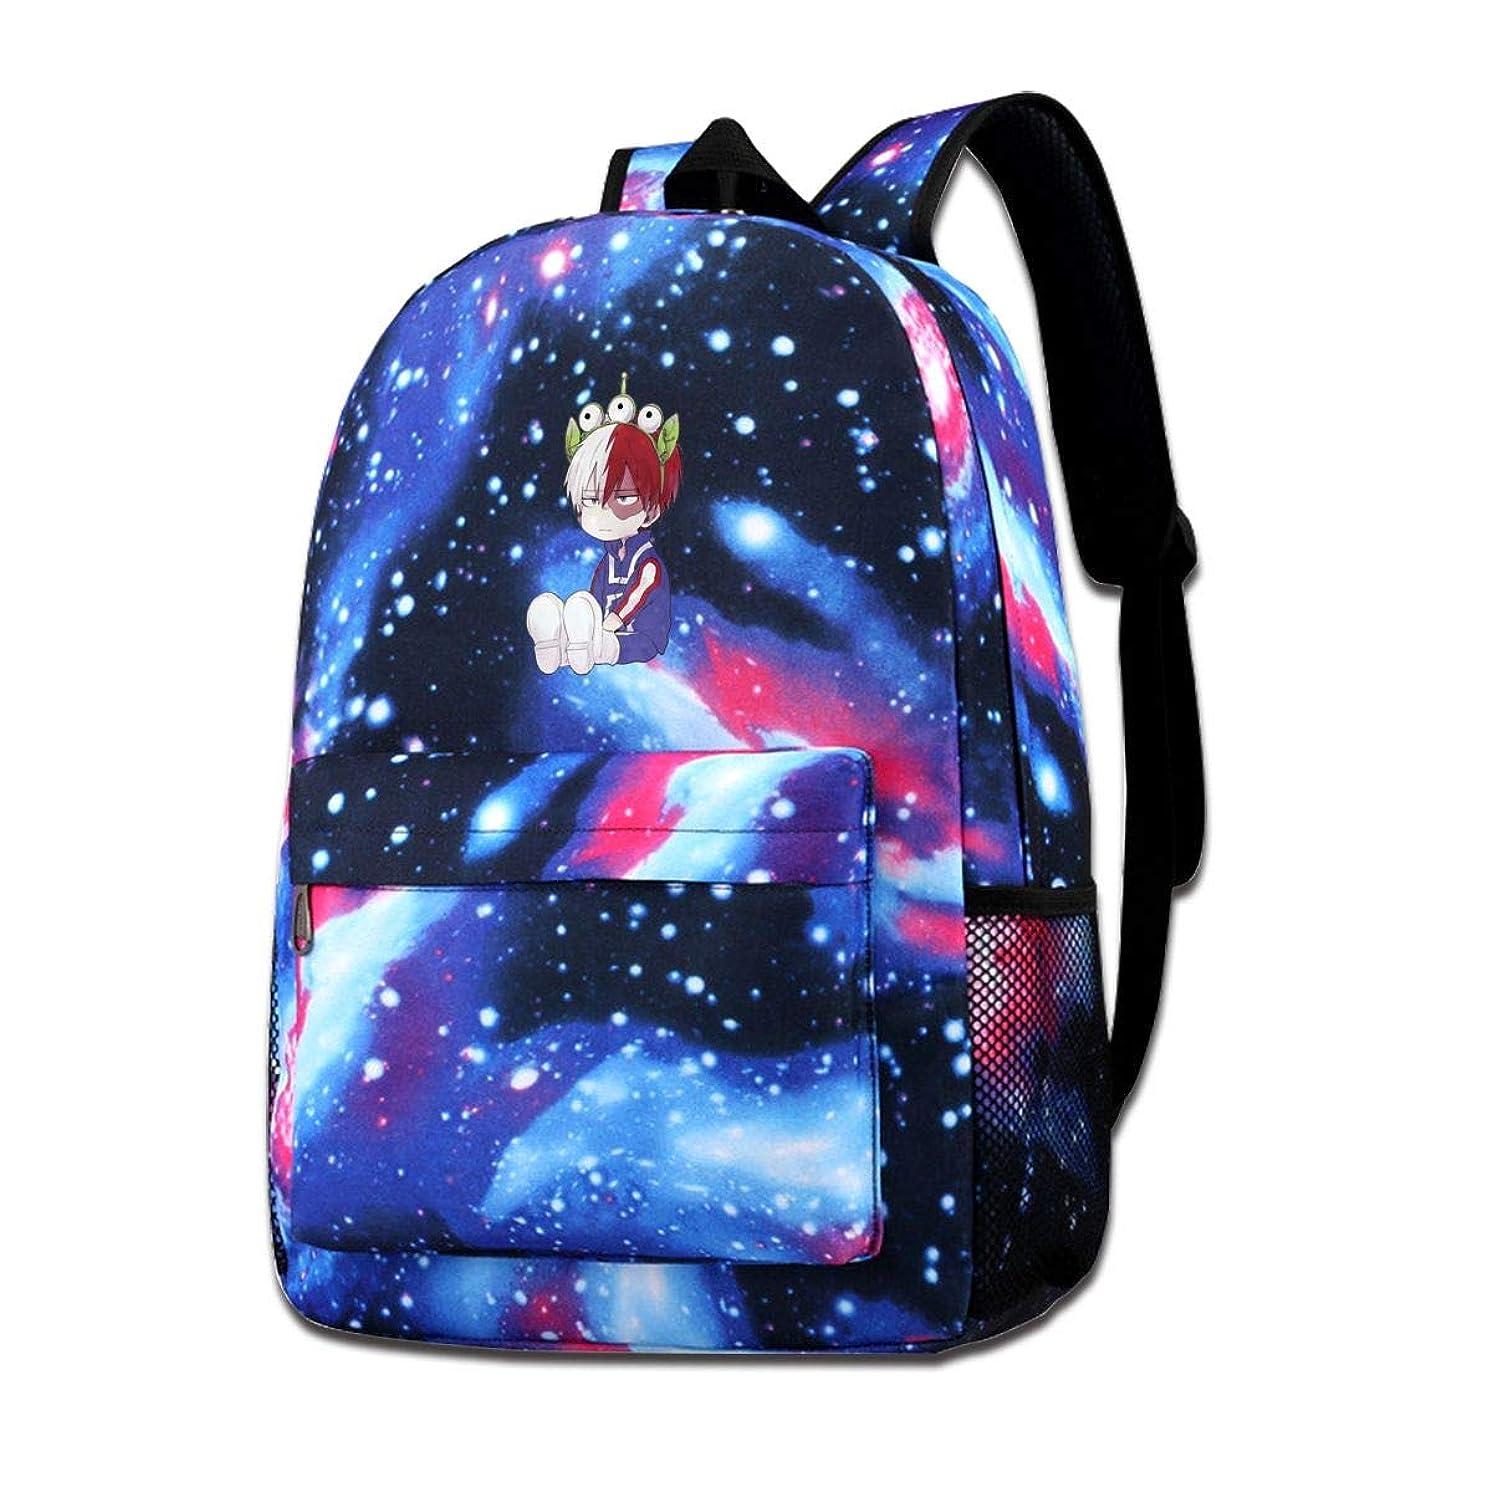 My Hero Academia Boku No Hero Todoroki Shoto Backpack Student Bookbag Laptop Bag Travel Computer Bag For Boys Girls Teens